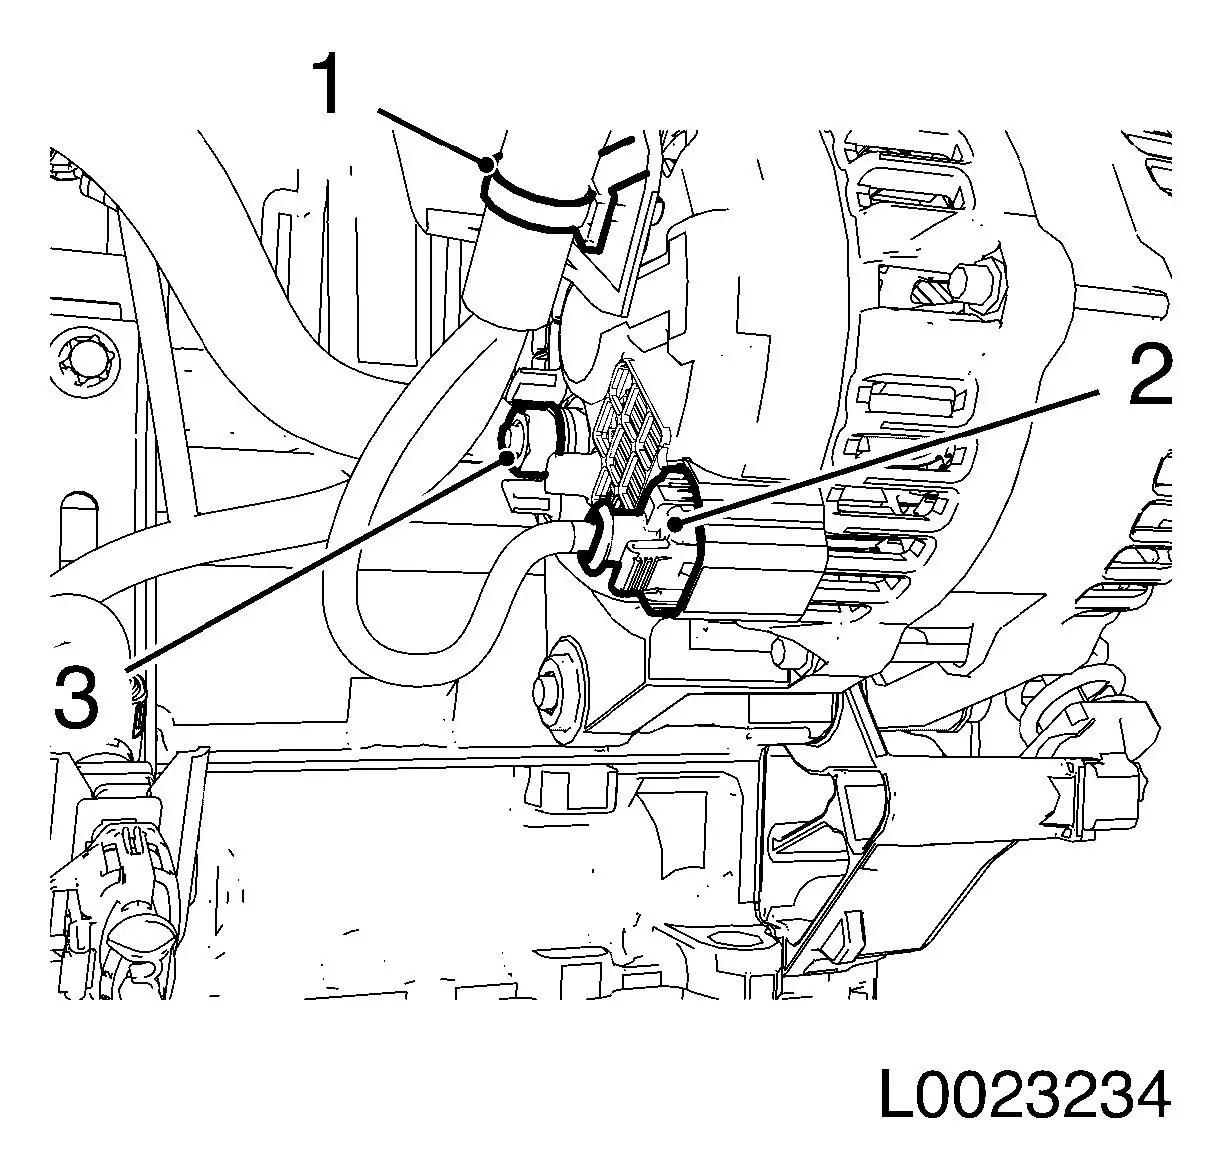 zafira fuse box diagram 2001